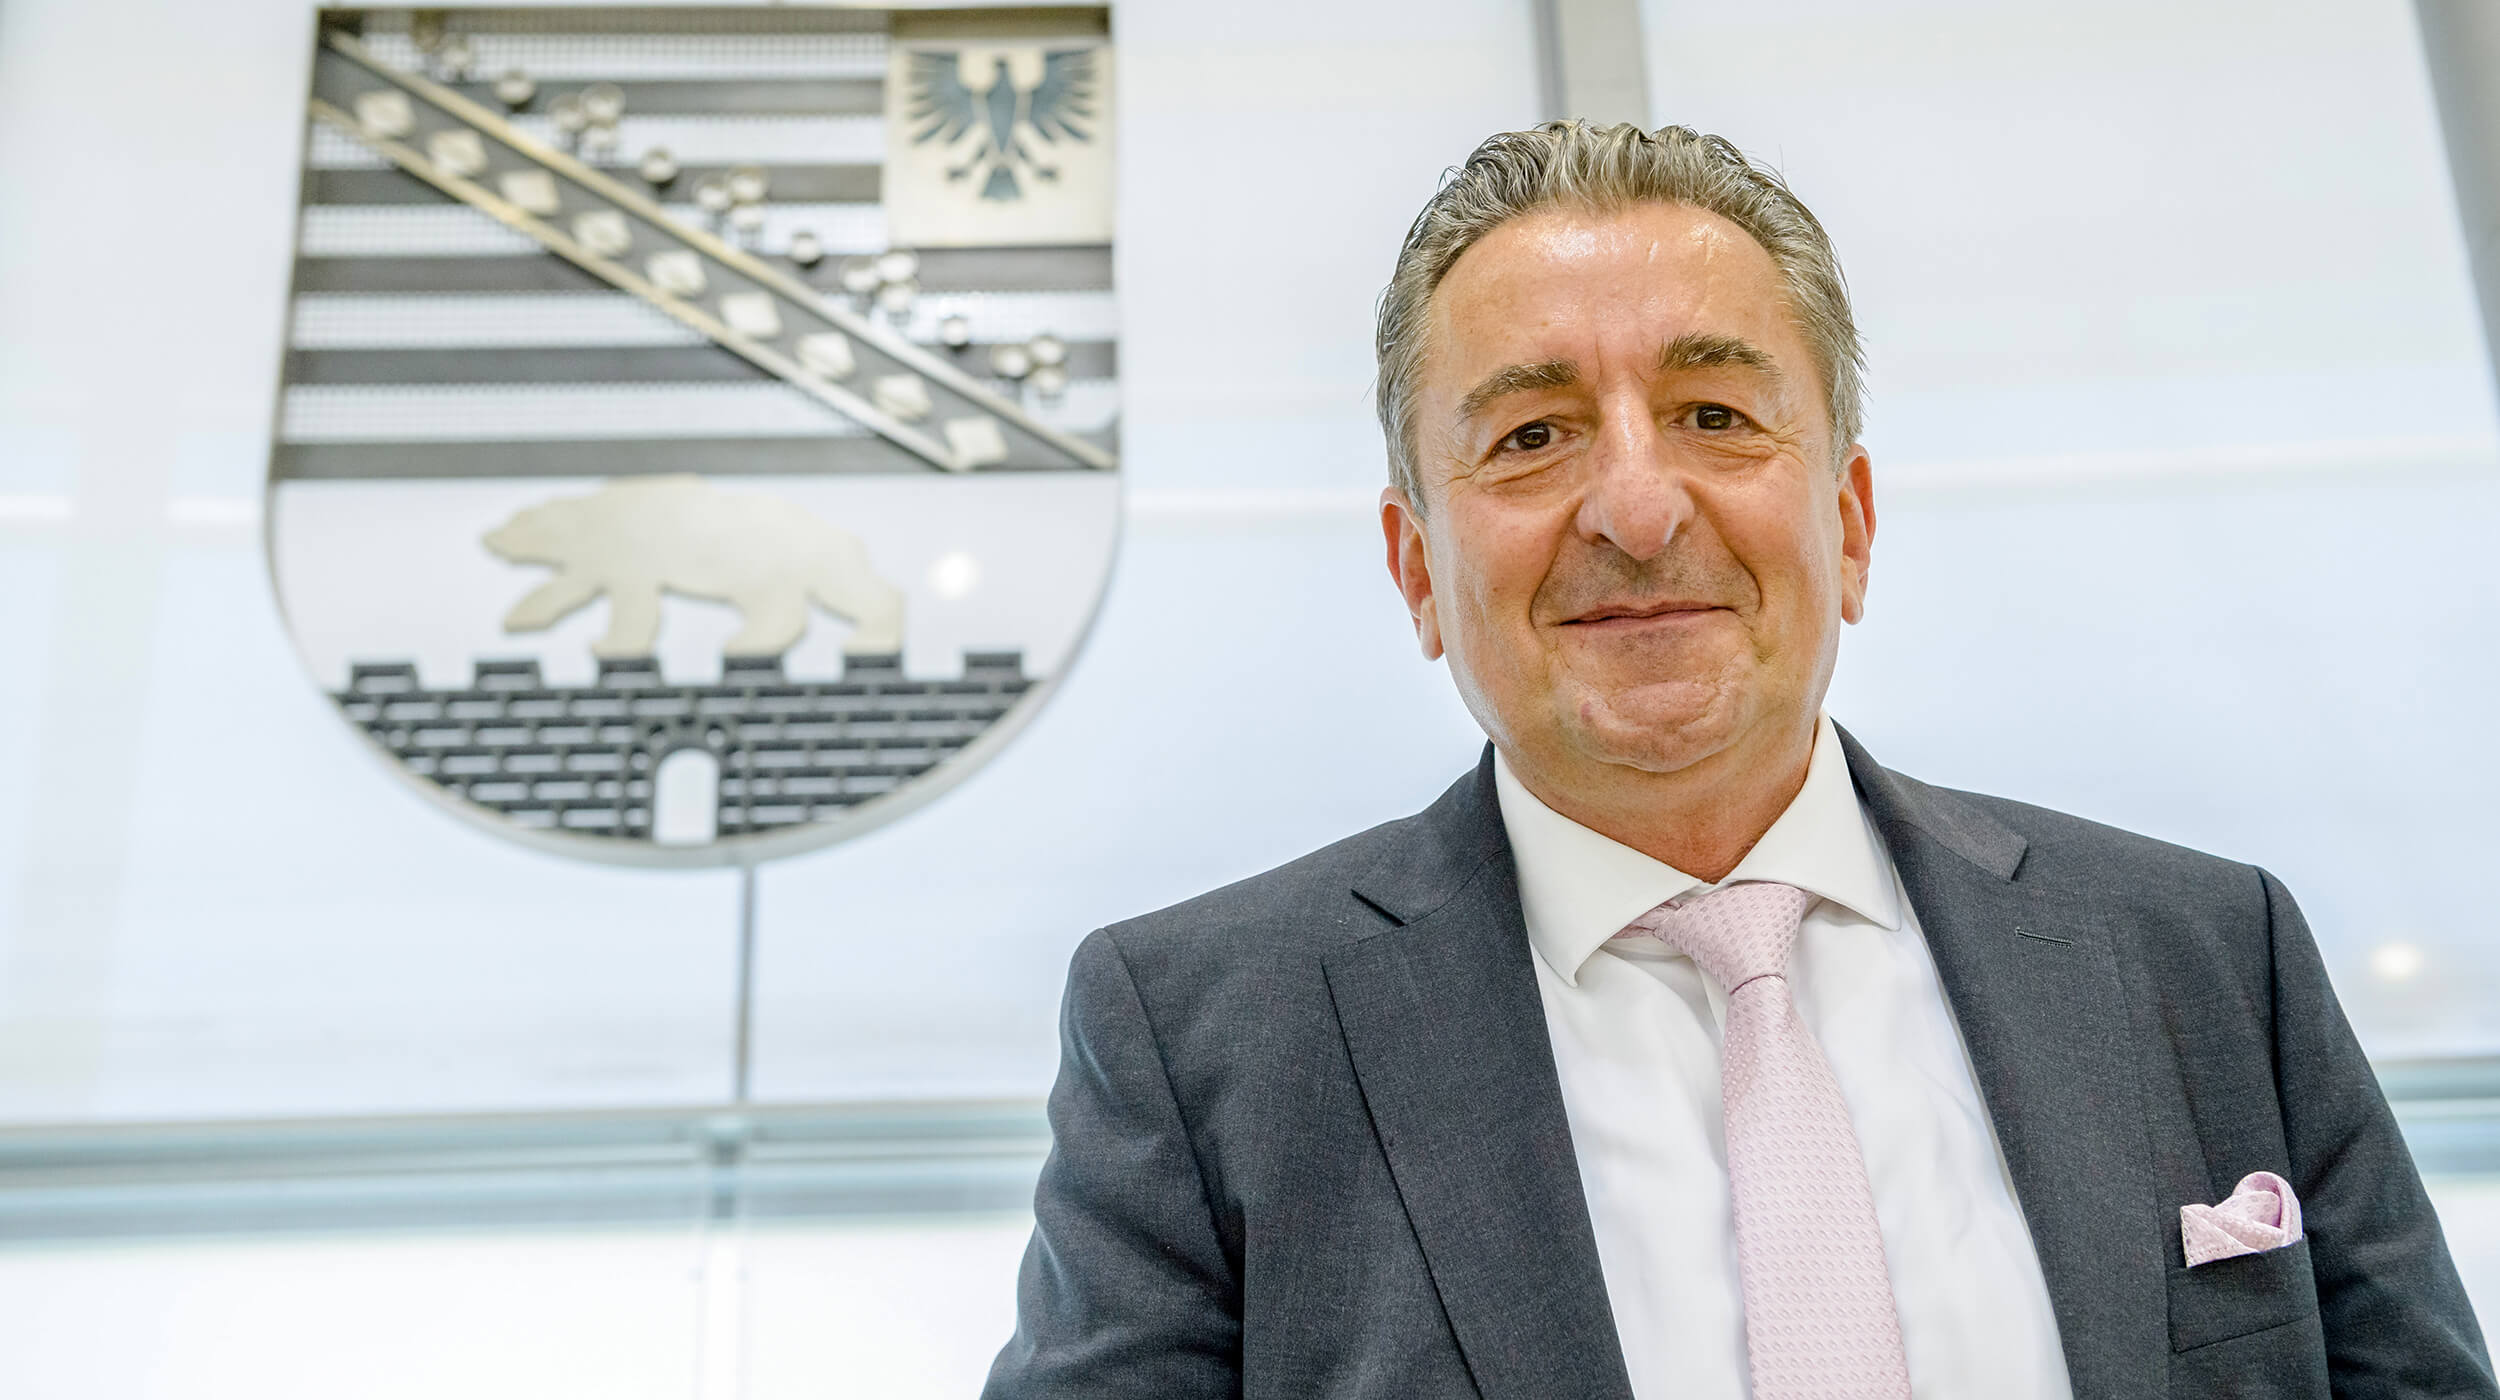 Gunnar Schellenberger, Präsident des Landtags Sachsen-Anhalt